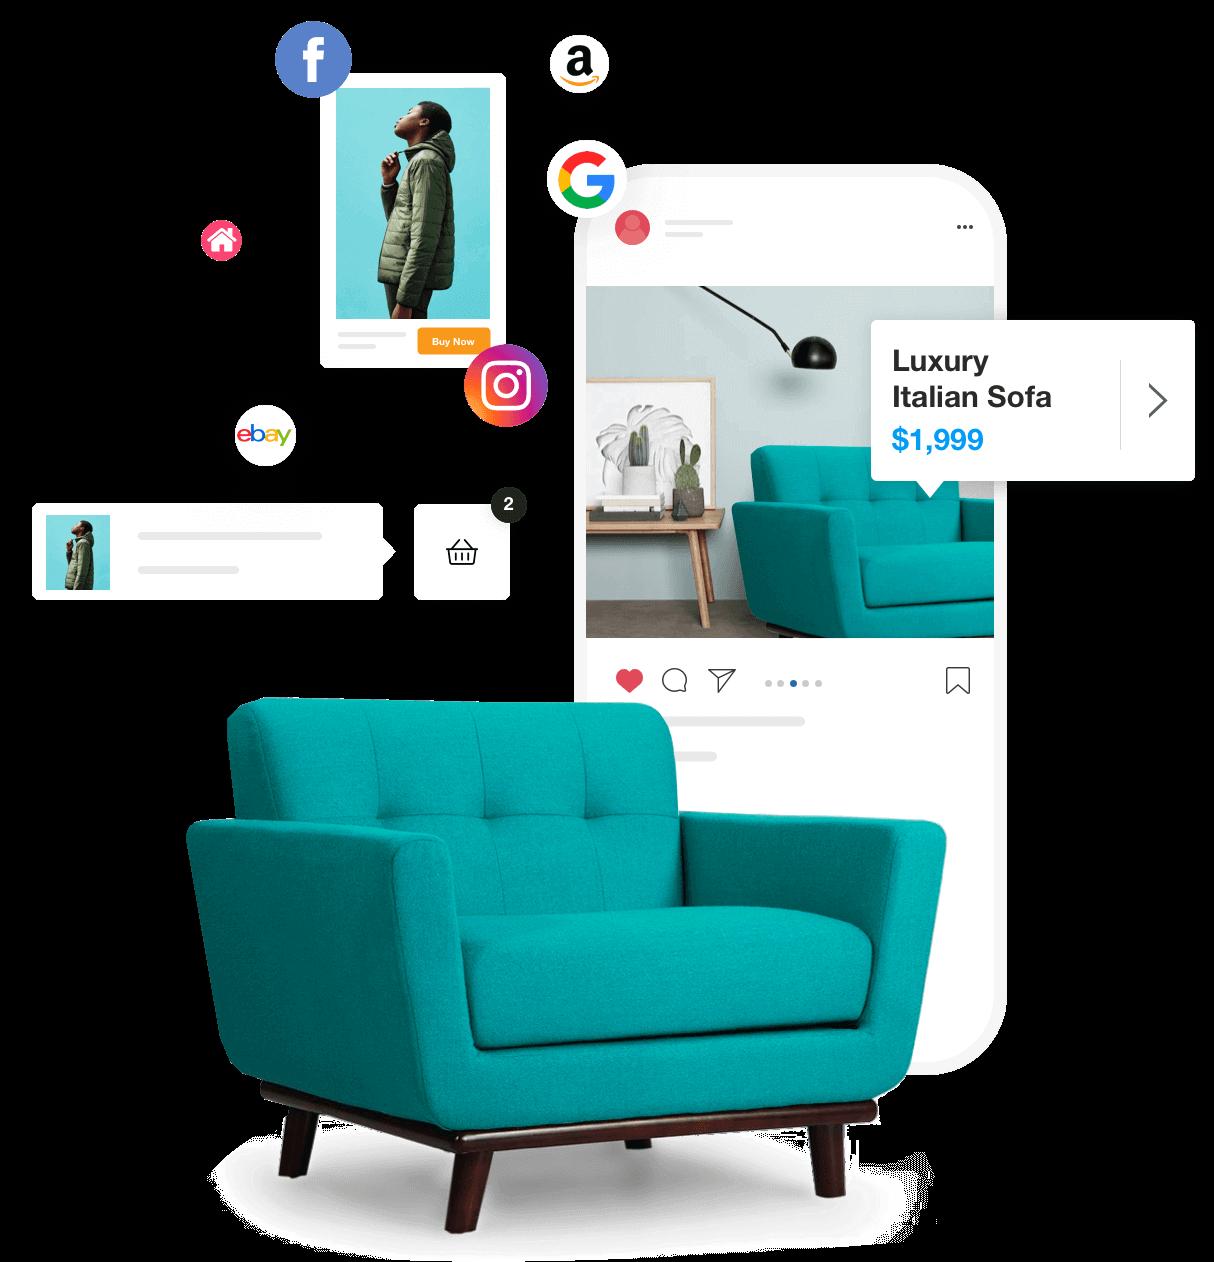 Online shopping integrations